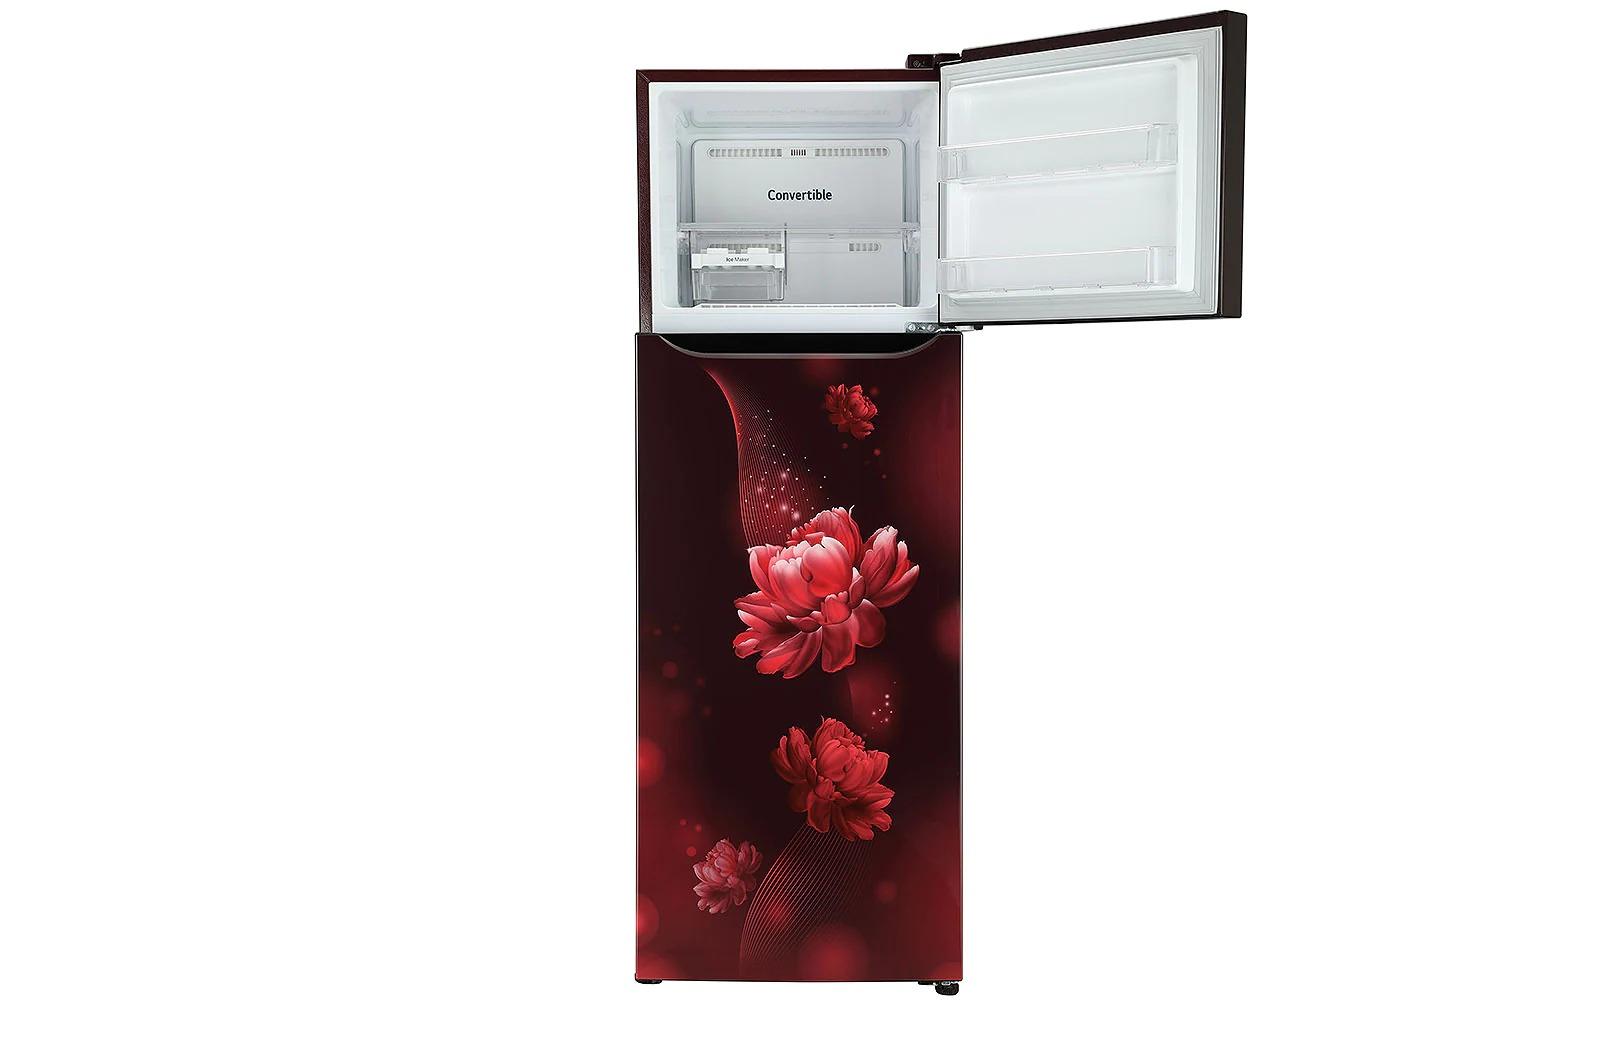 LG (GL-T322SSCY) 308 Litres ConvertiblePLUS Fridge With Smart Inverter Compressor , Door Cooling+™, Smart Diagnosis™, Auto Smart Connect™